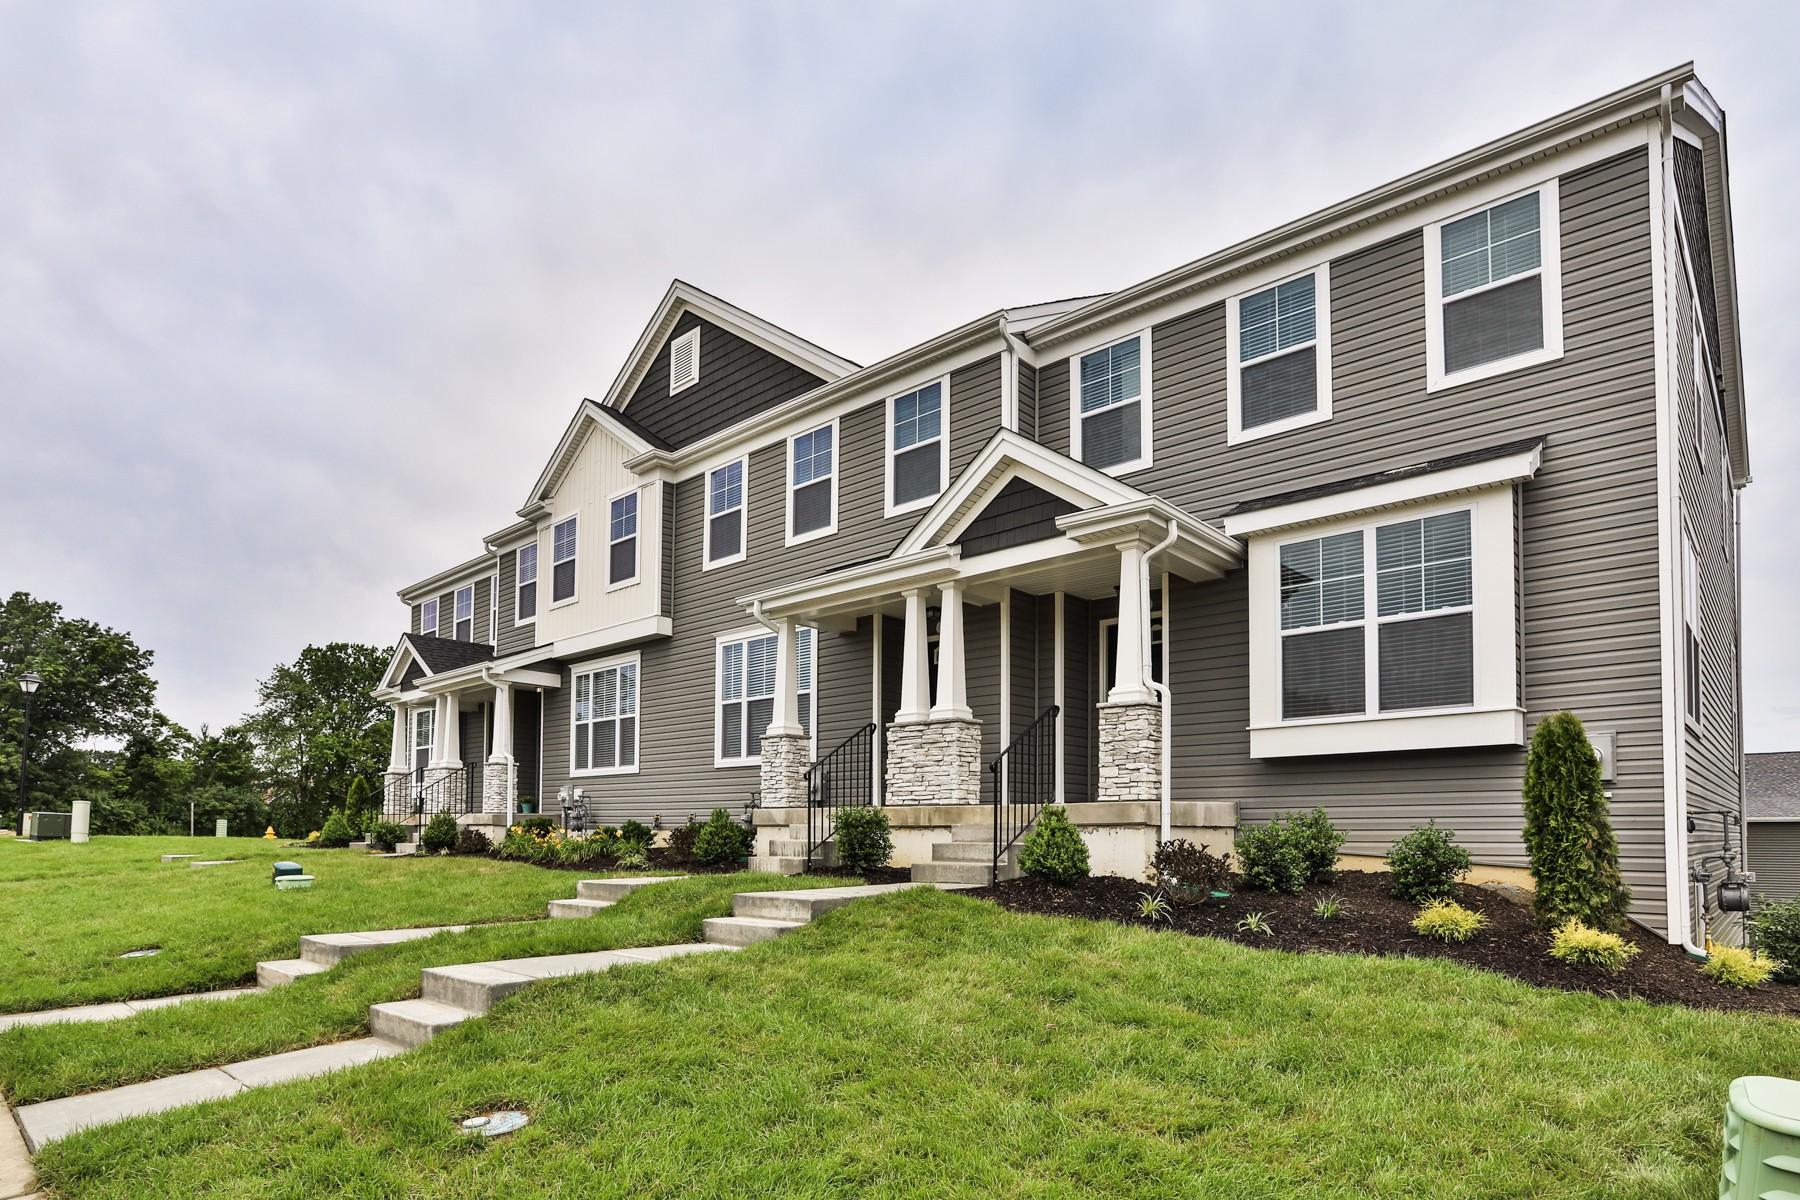 Apartments Near Cottleville Creekside Landing Tri-Level Townhouse & Villas for Cottleville Students in Cottleville, MO